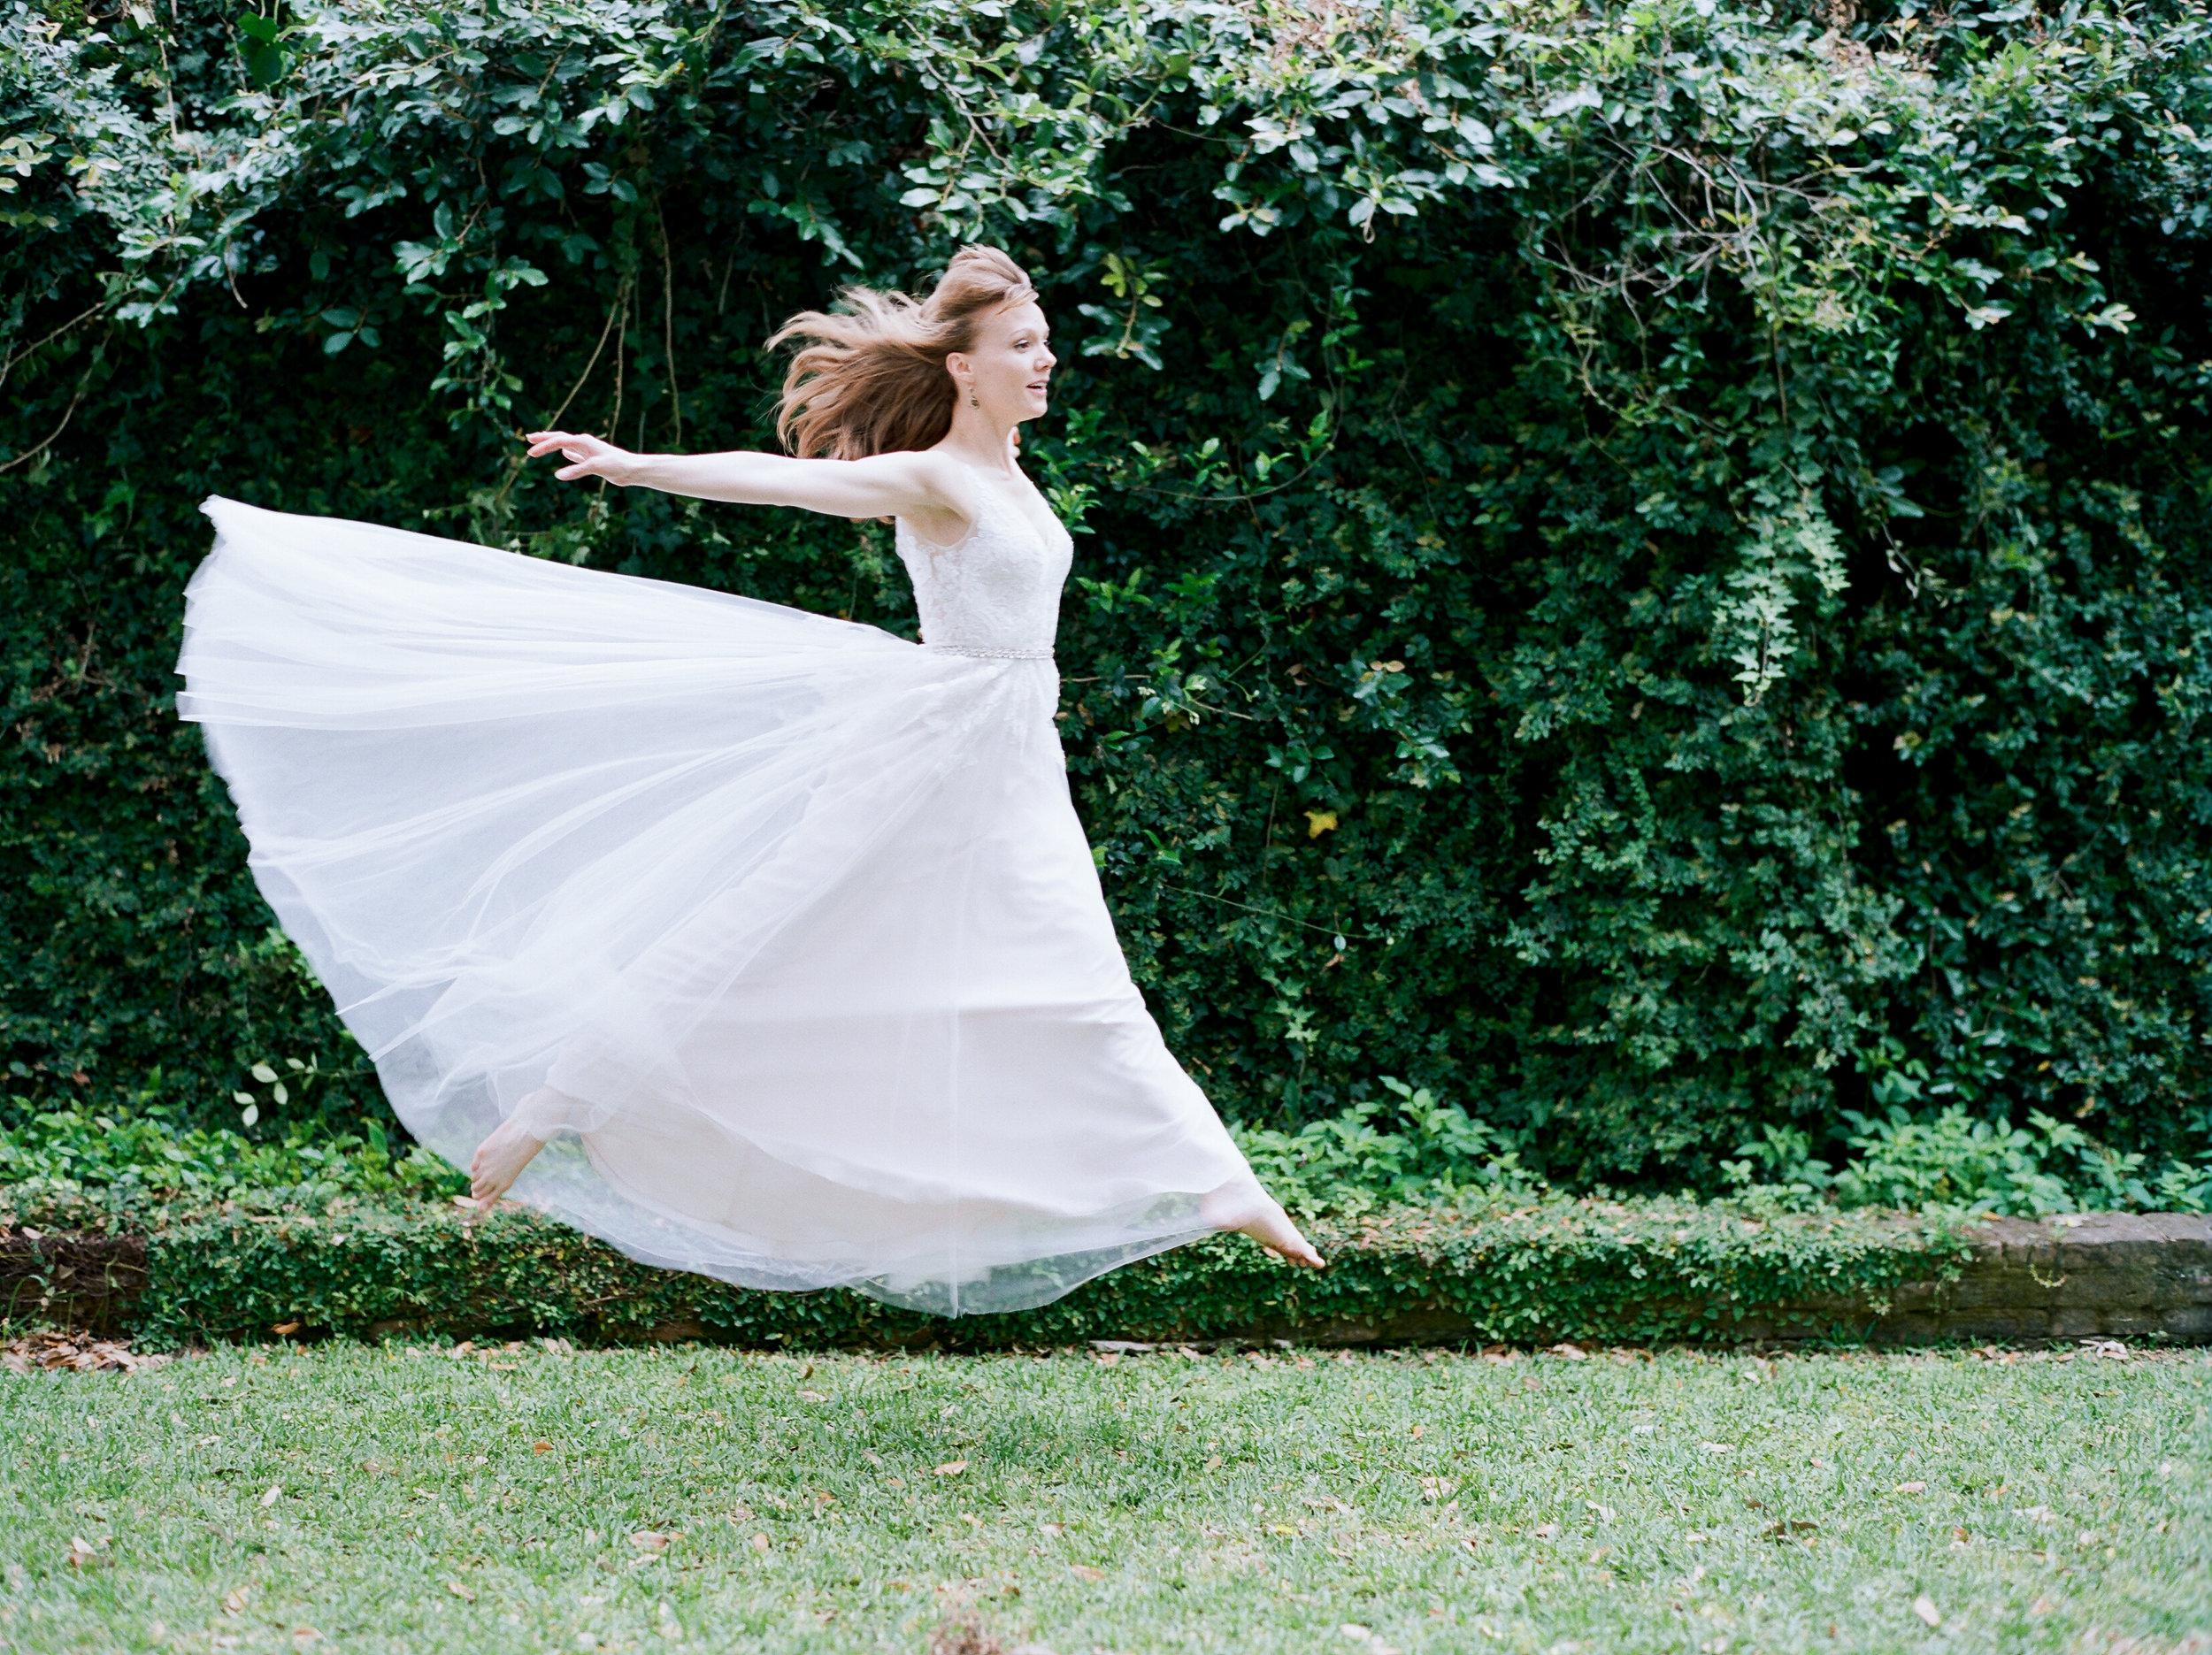 bride jumping, wedding dress flowing